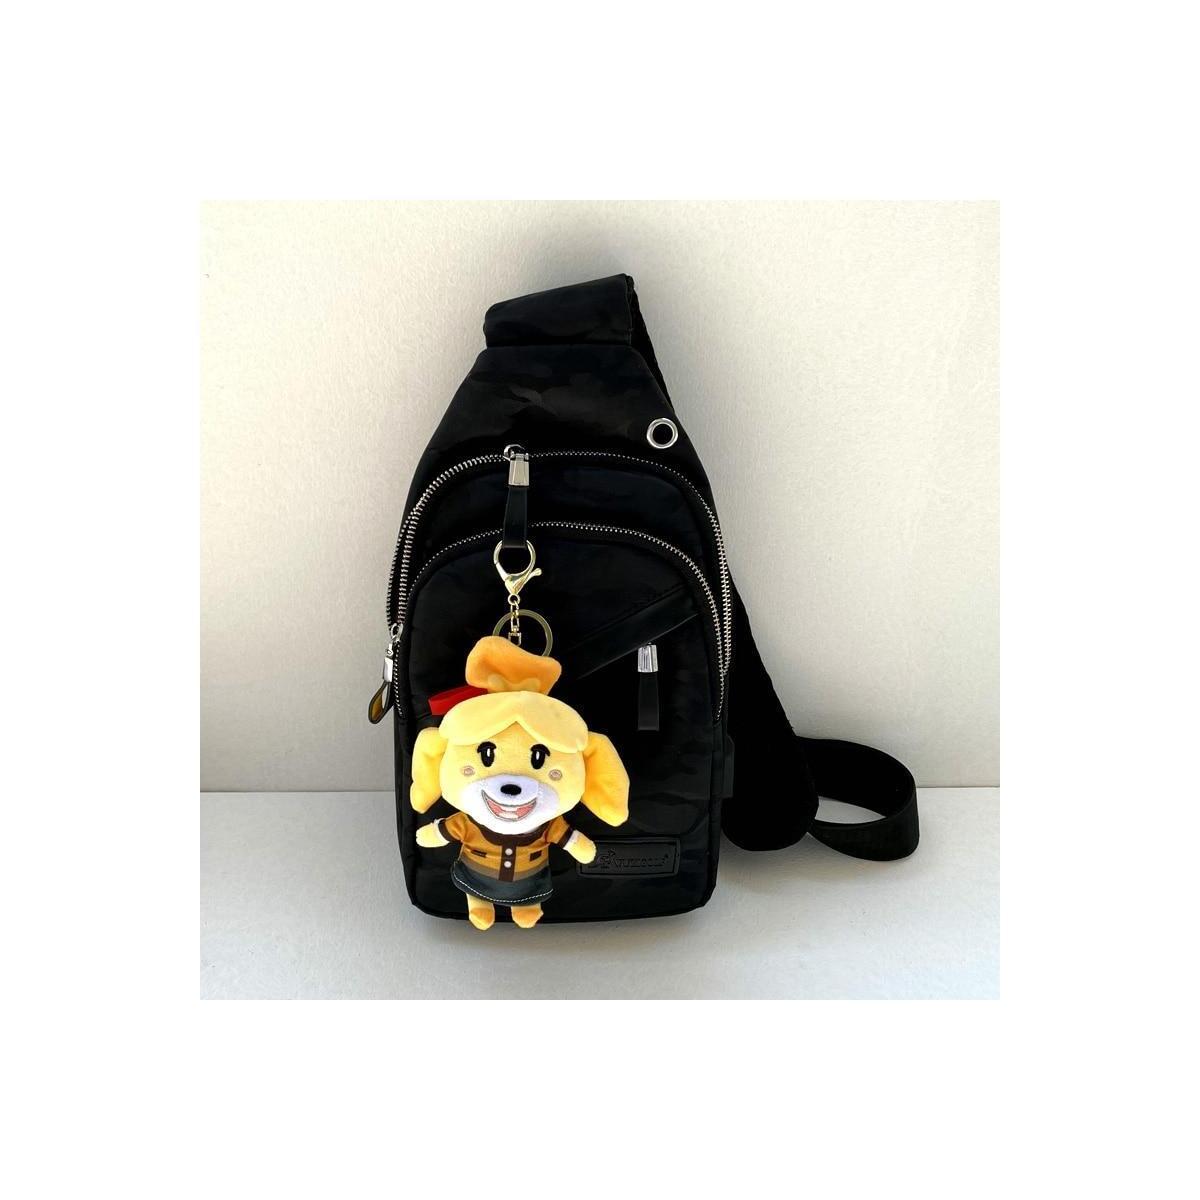 Animal Crossing Plush Villager Keychains, 12cm-K.K